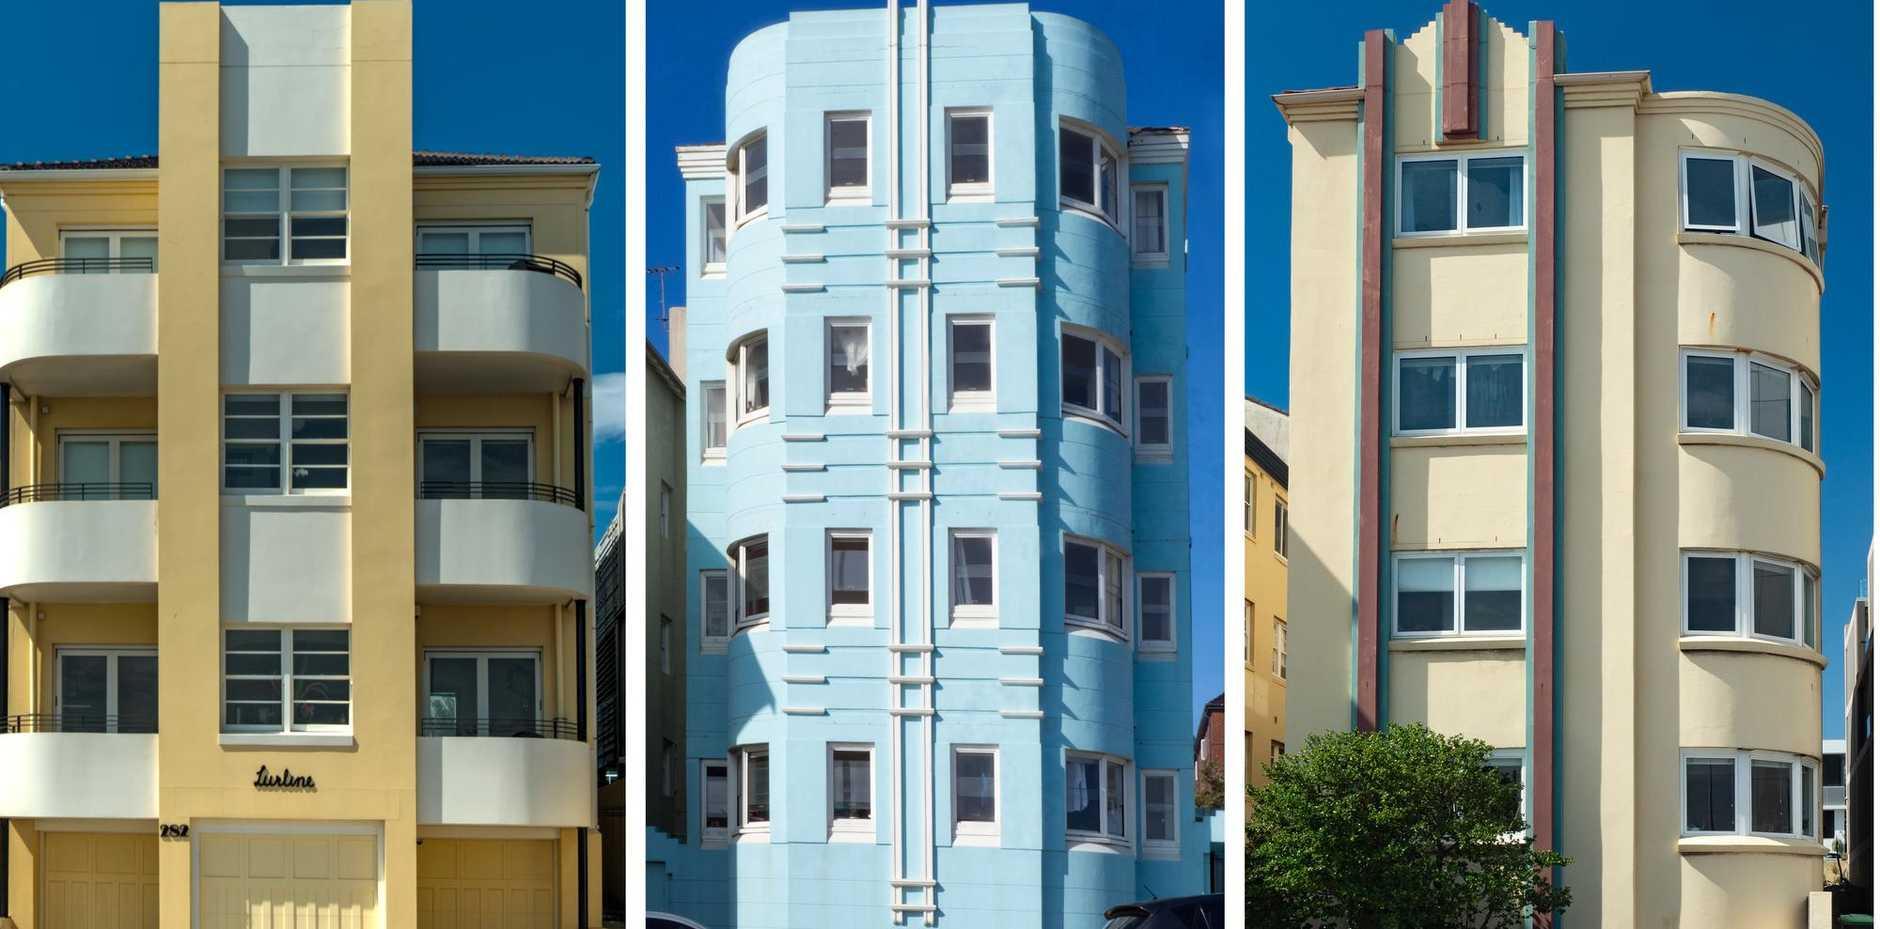 Examples of Art Deco buildings in Bondi.